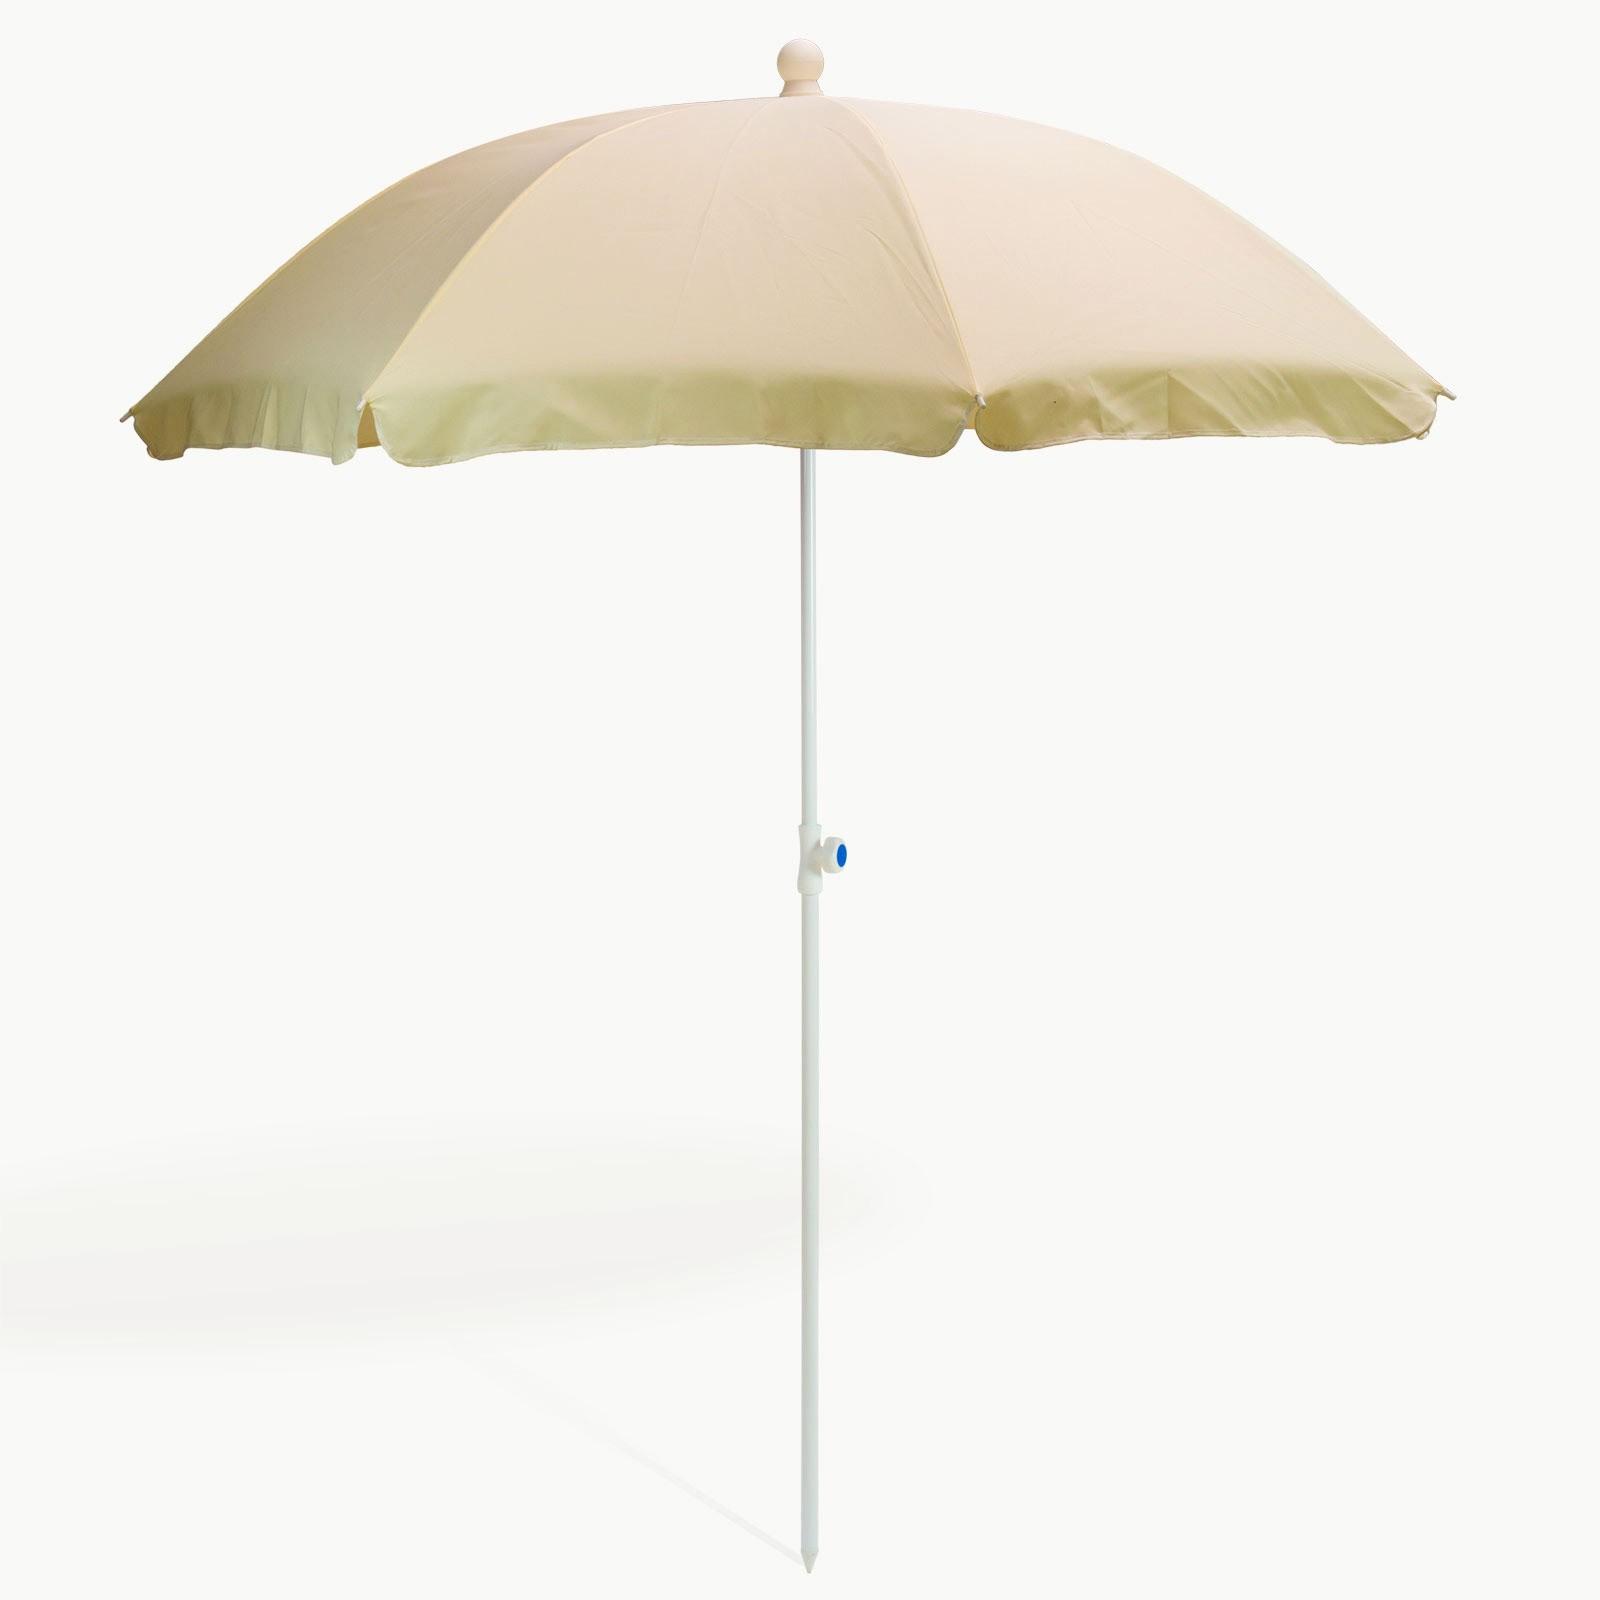 Dema Strandschirm natur/creme 180 cm UV30 Sonnenschirm Gartenschirm Schirm 41275